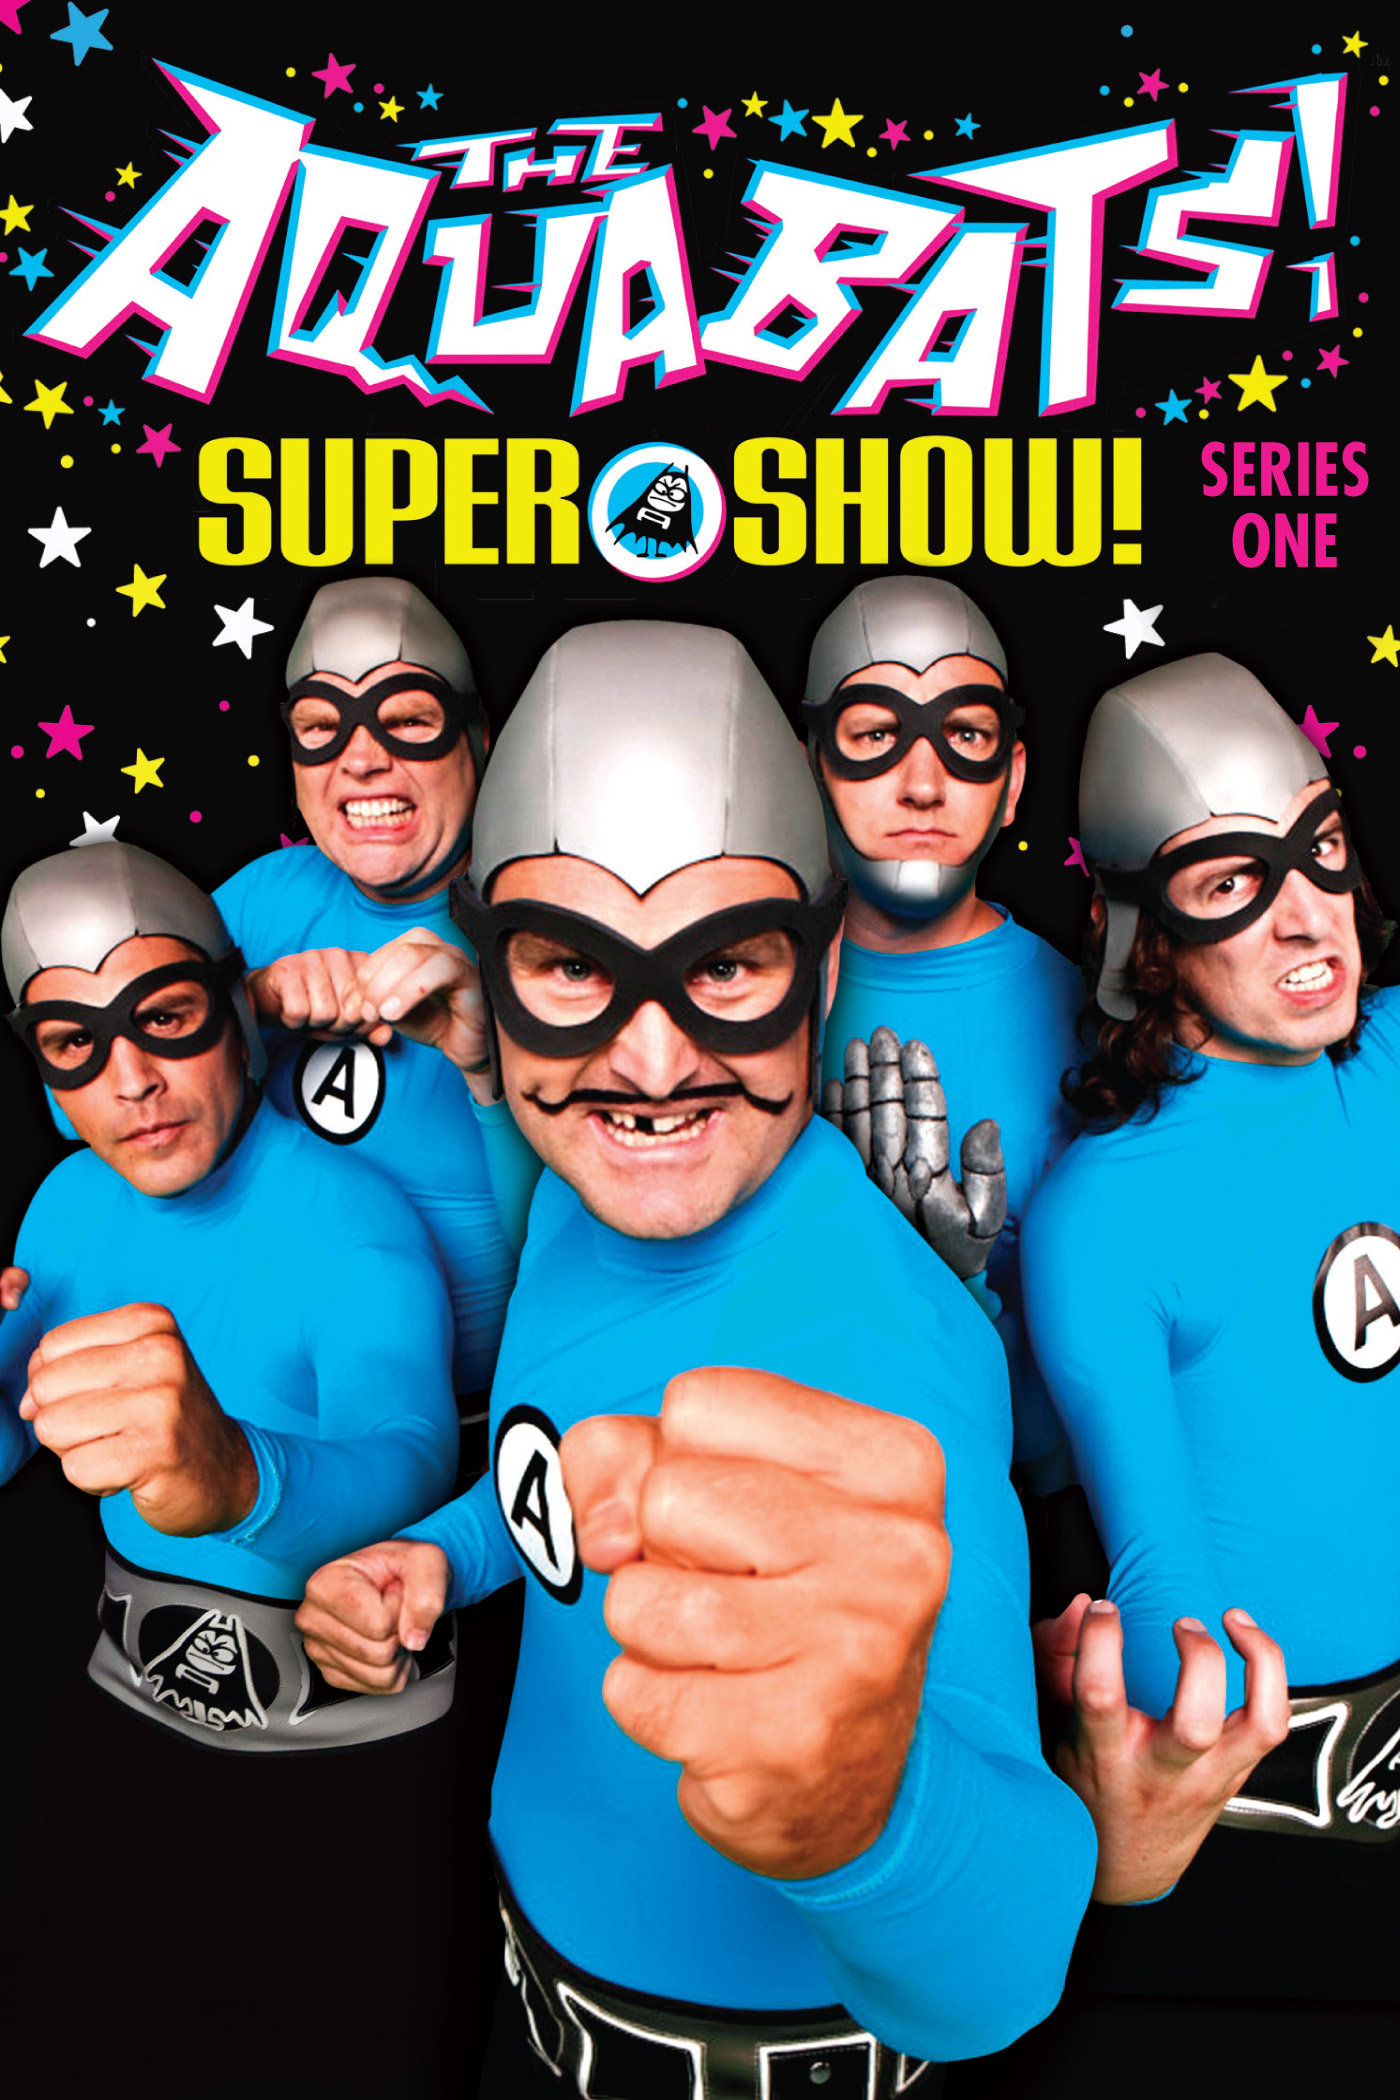 Christian Jacobs, Richard Falomir, Chad Larson, James Briggs, and Ian Fowles in The Aquabats! Super Show! (2012)